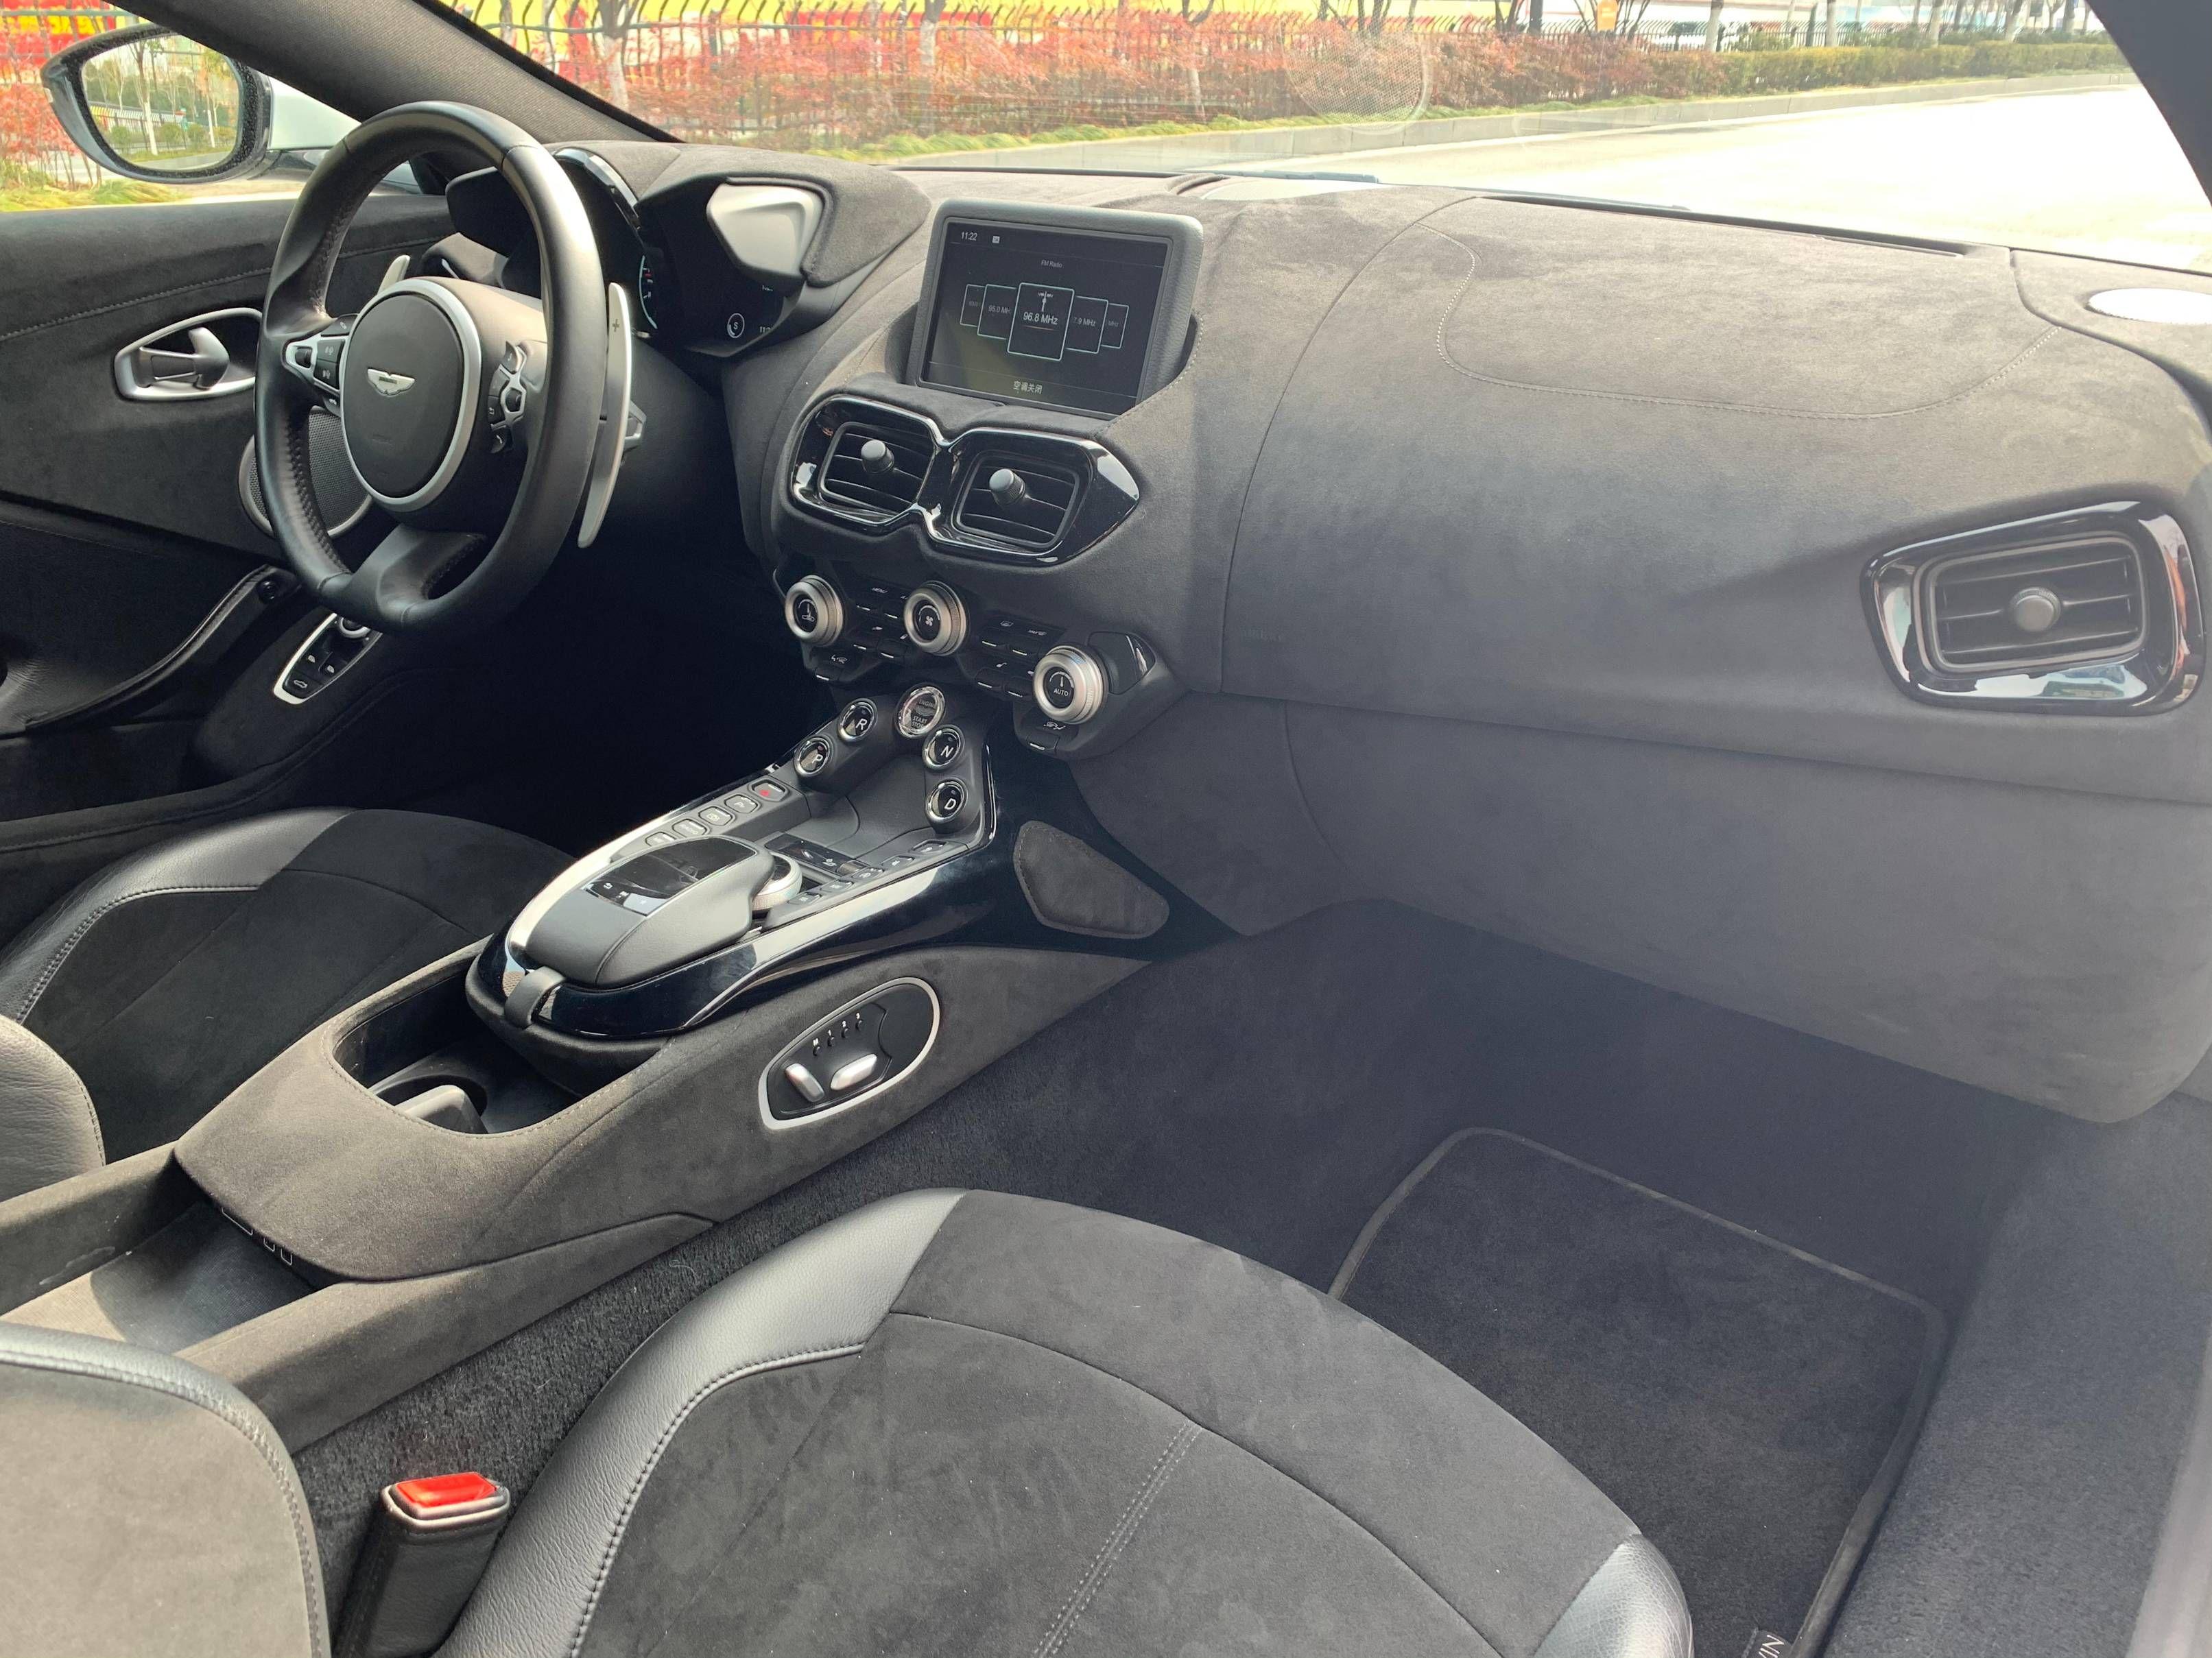 V8 Vantage 2018款 4.0T V8 Coupe